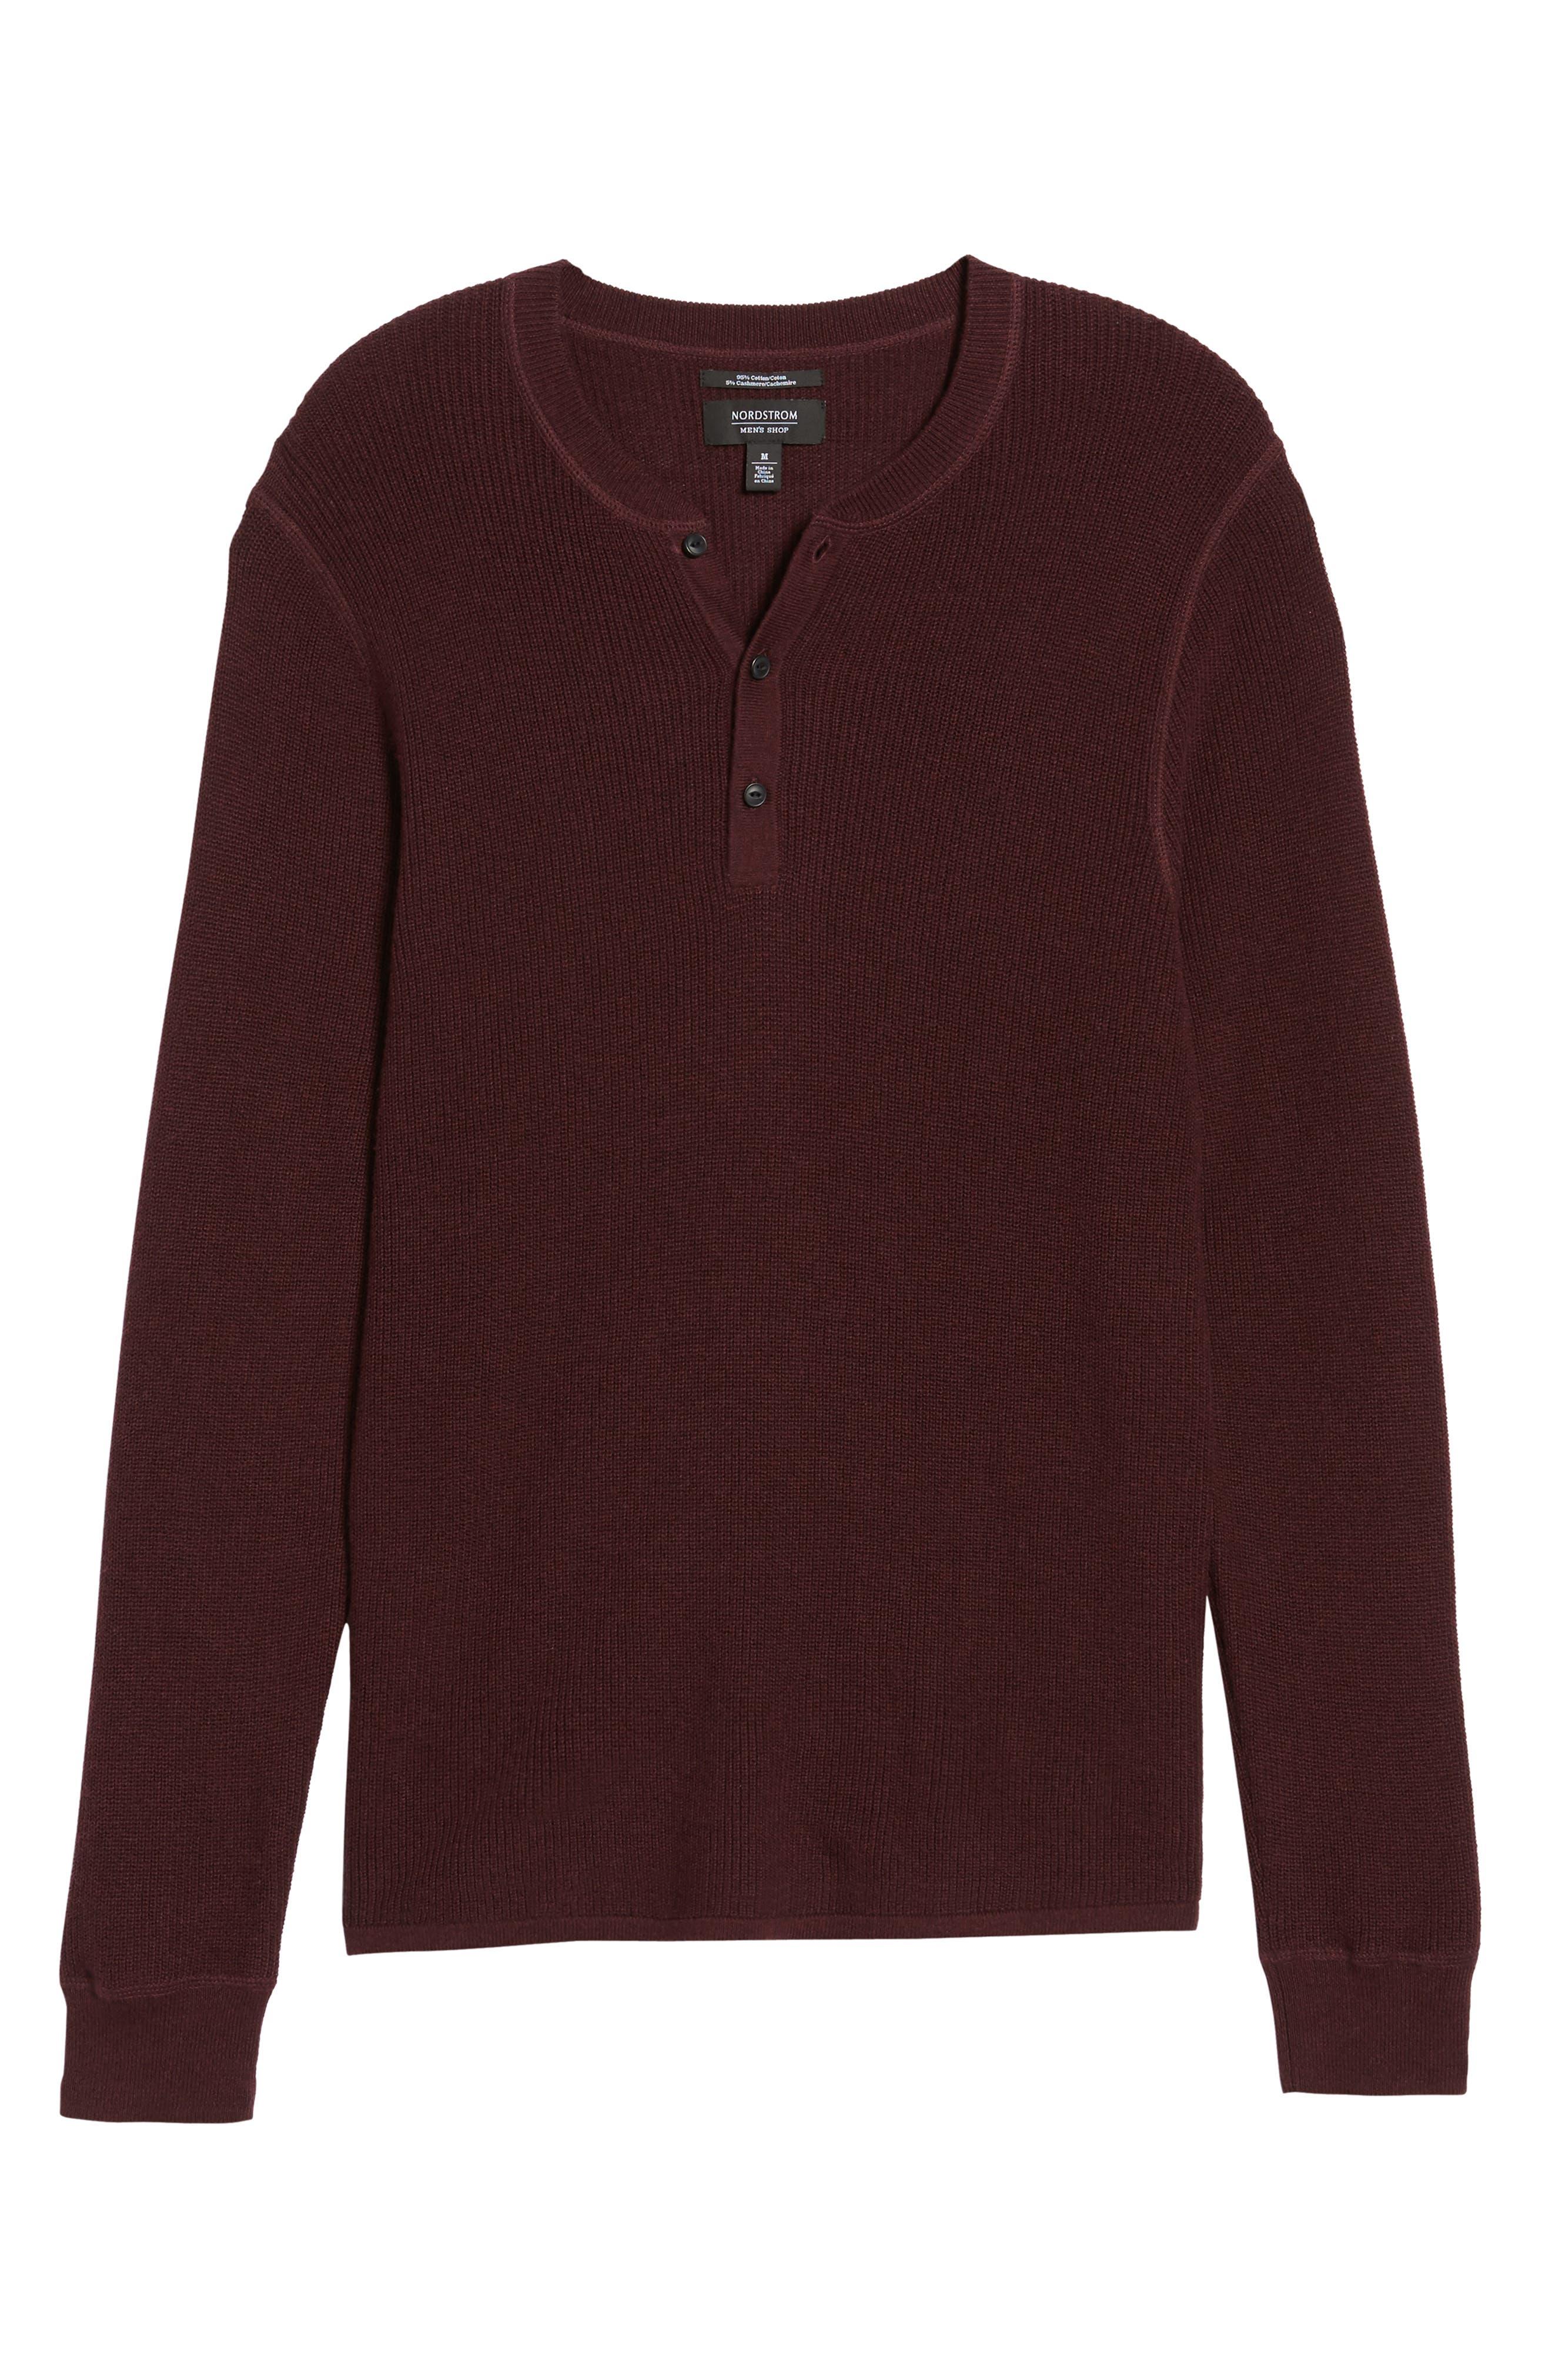 Cotton & Cashmere Henley Sweater,                             Alternate thumbnail 18, color,